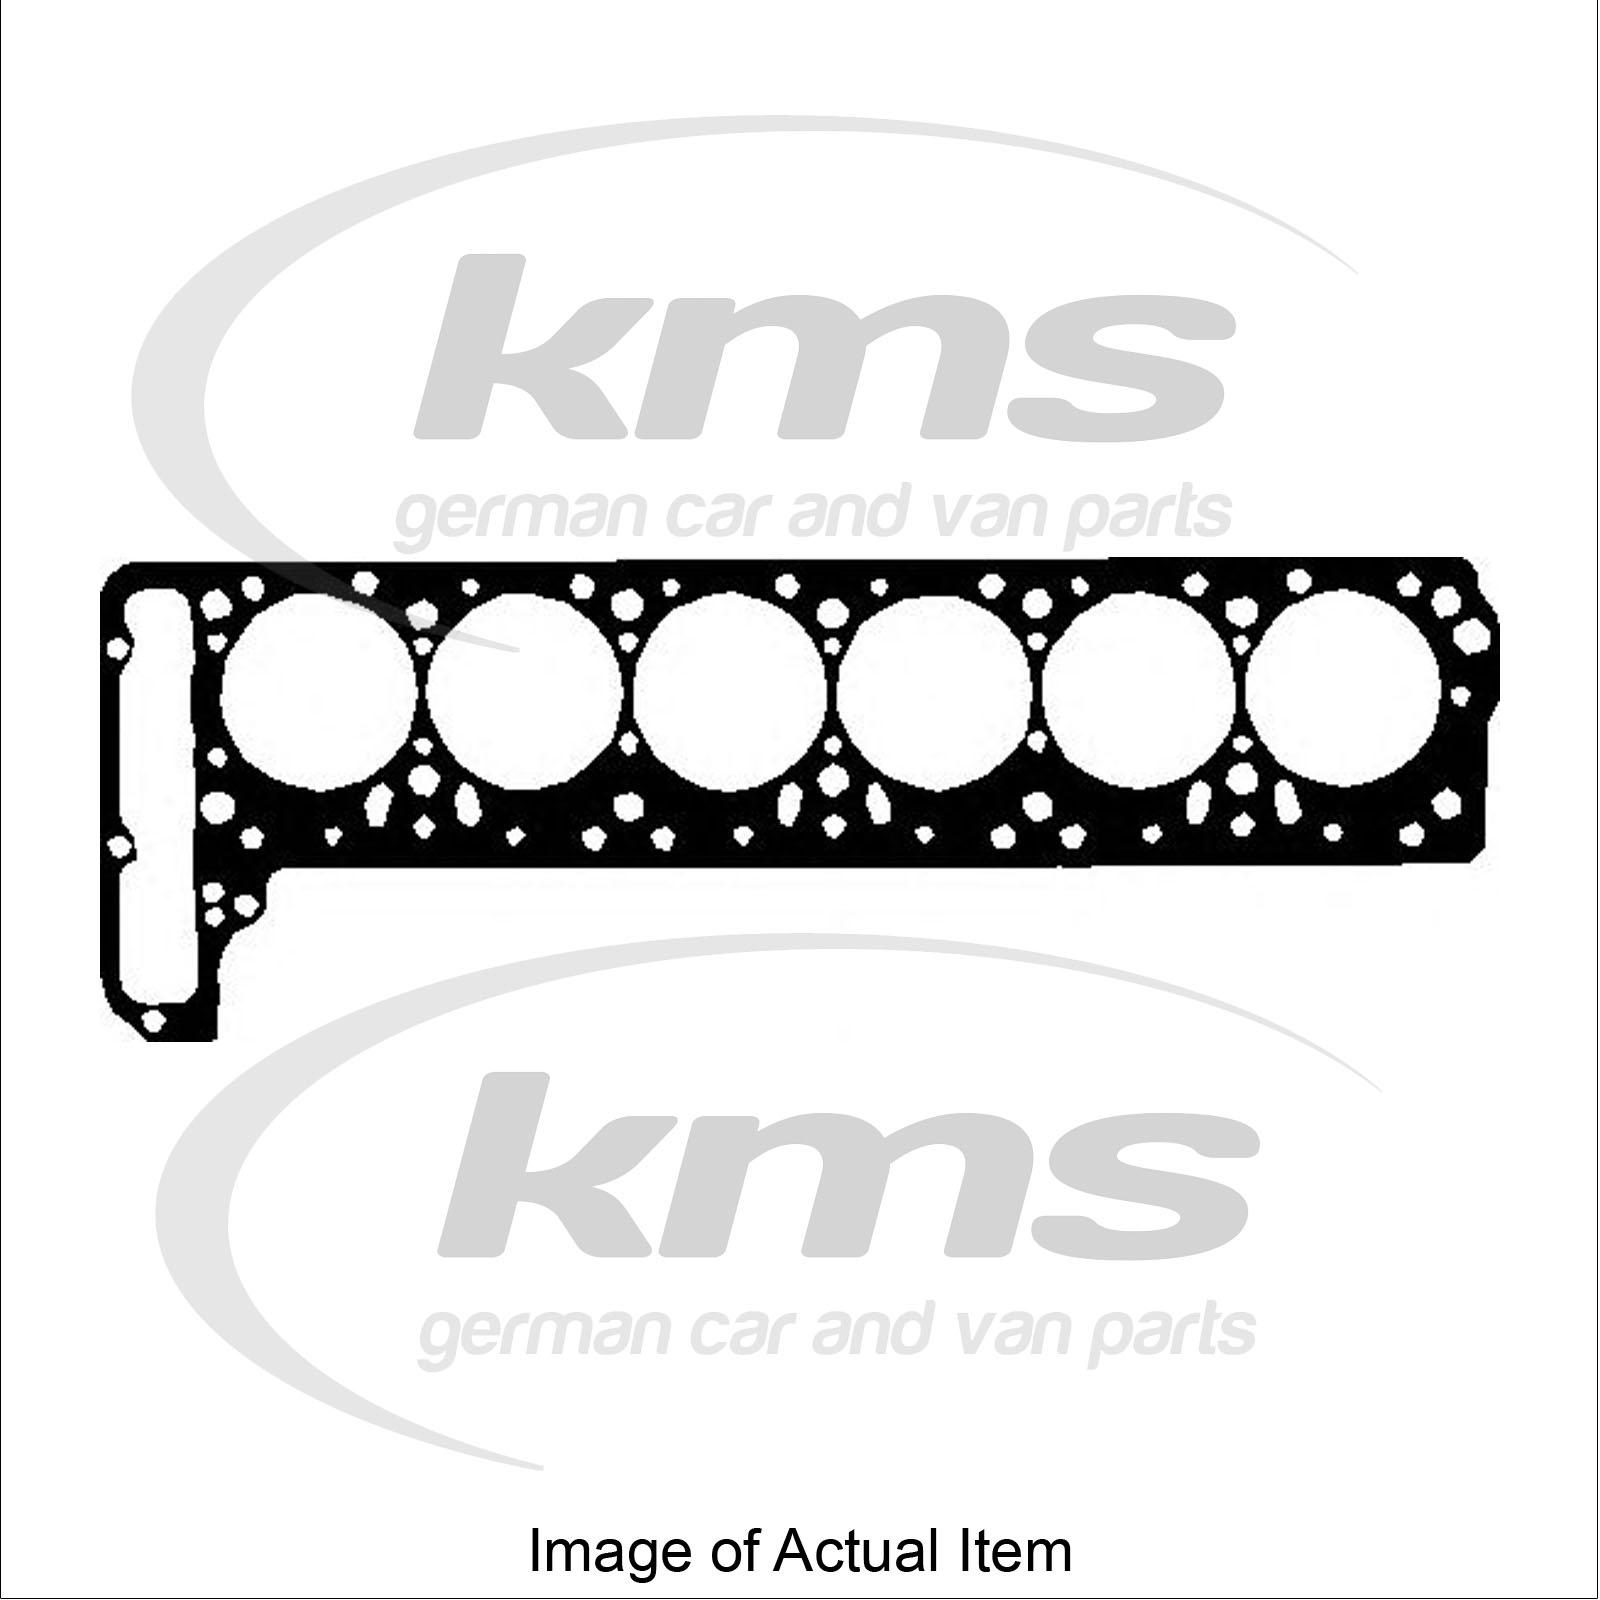 CYLINDER HEAD GASKET MERCEDES G-CLASS (W460) 280 GE (460,2